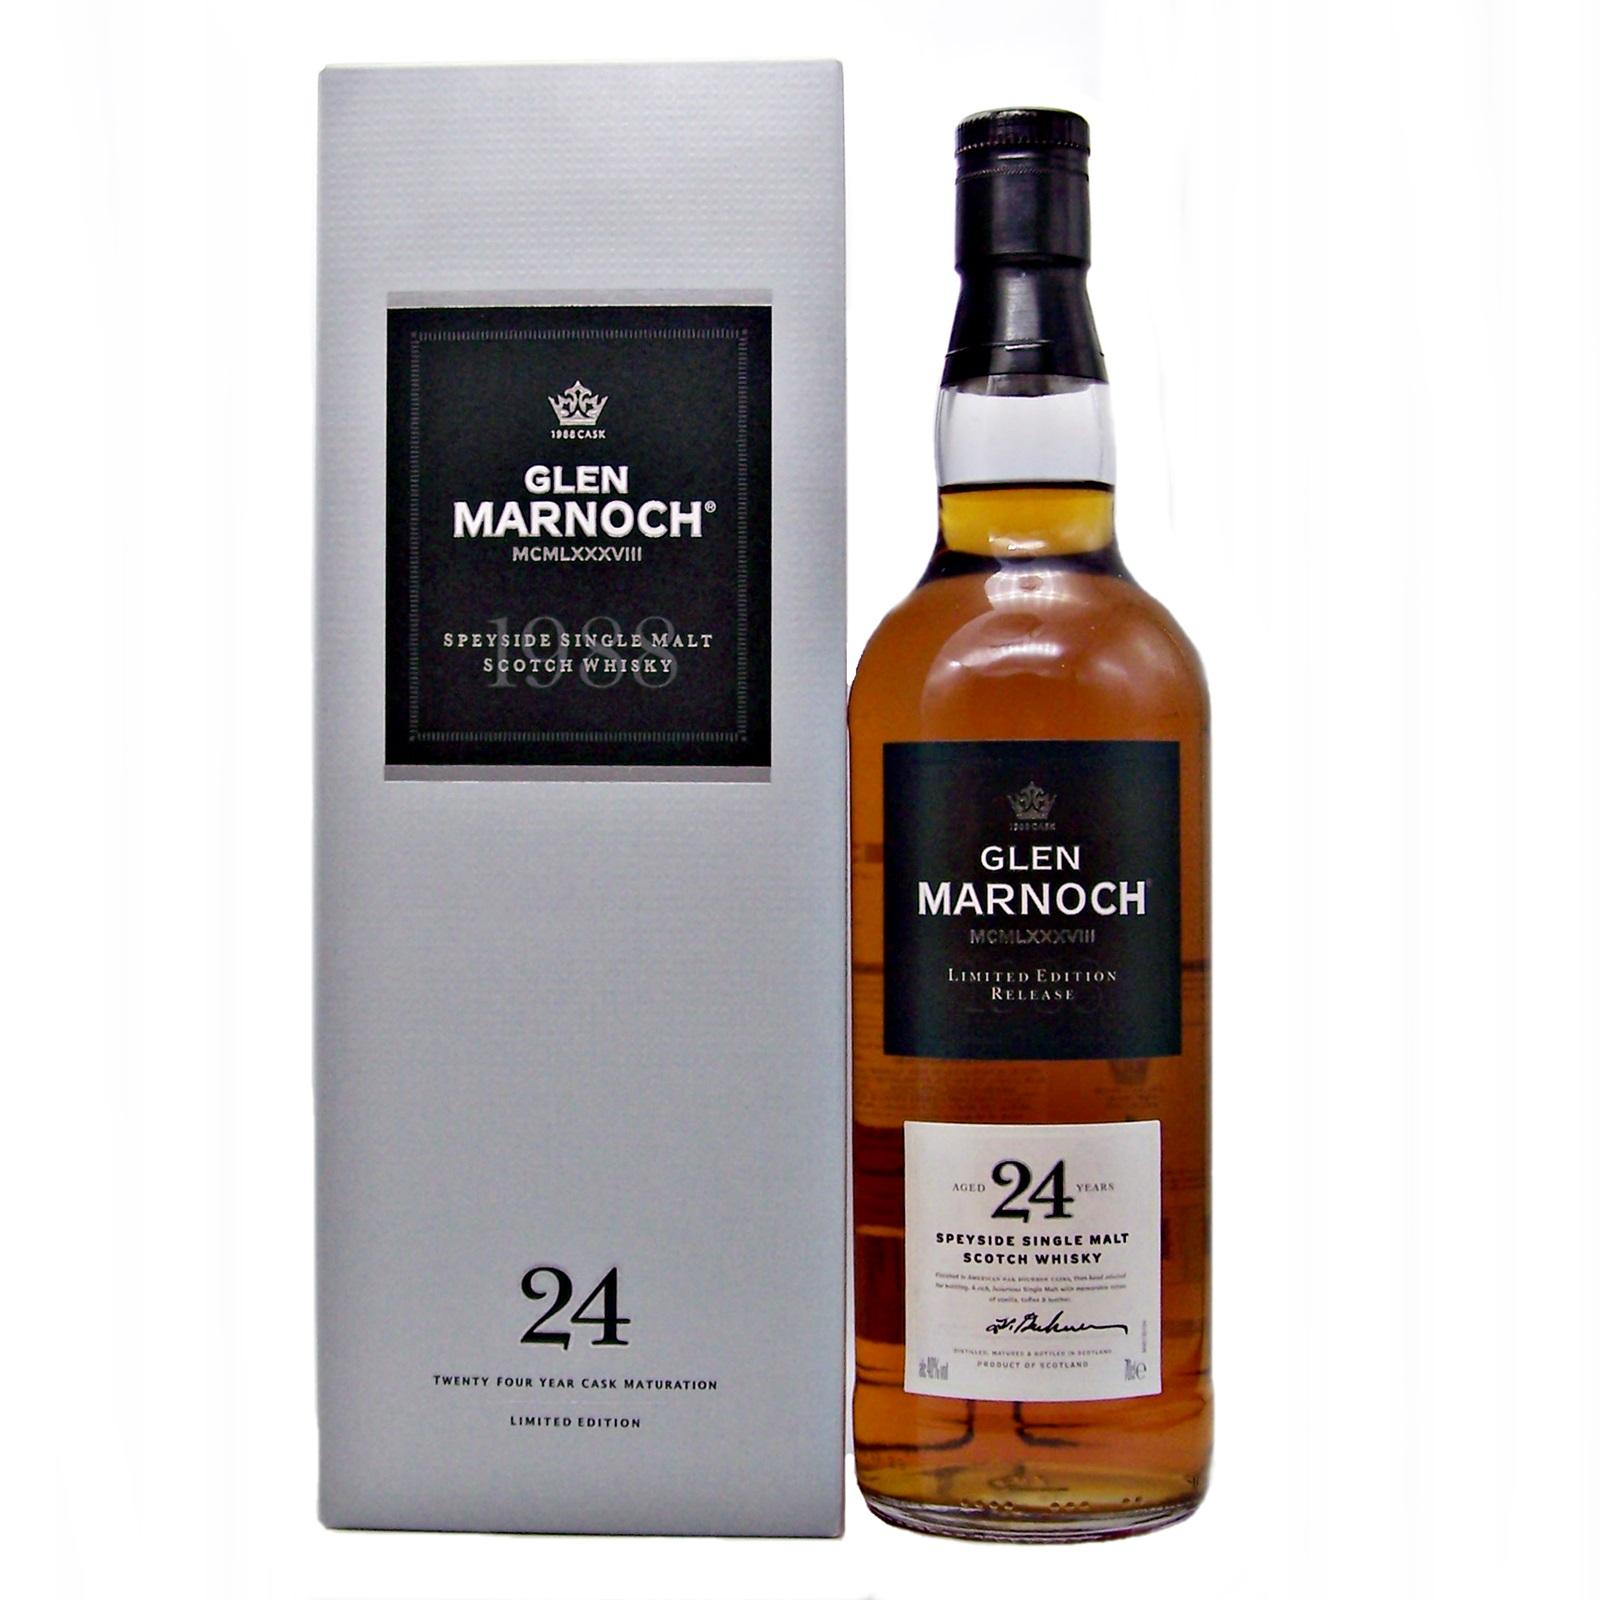 Glen Marnoch 24 year old 1988 Single Malt Whisky